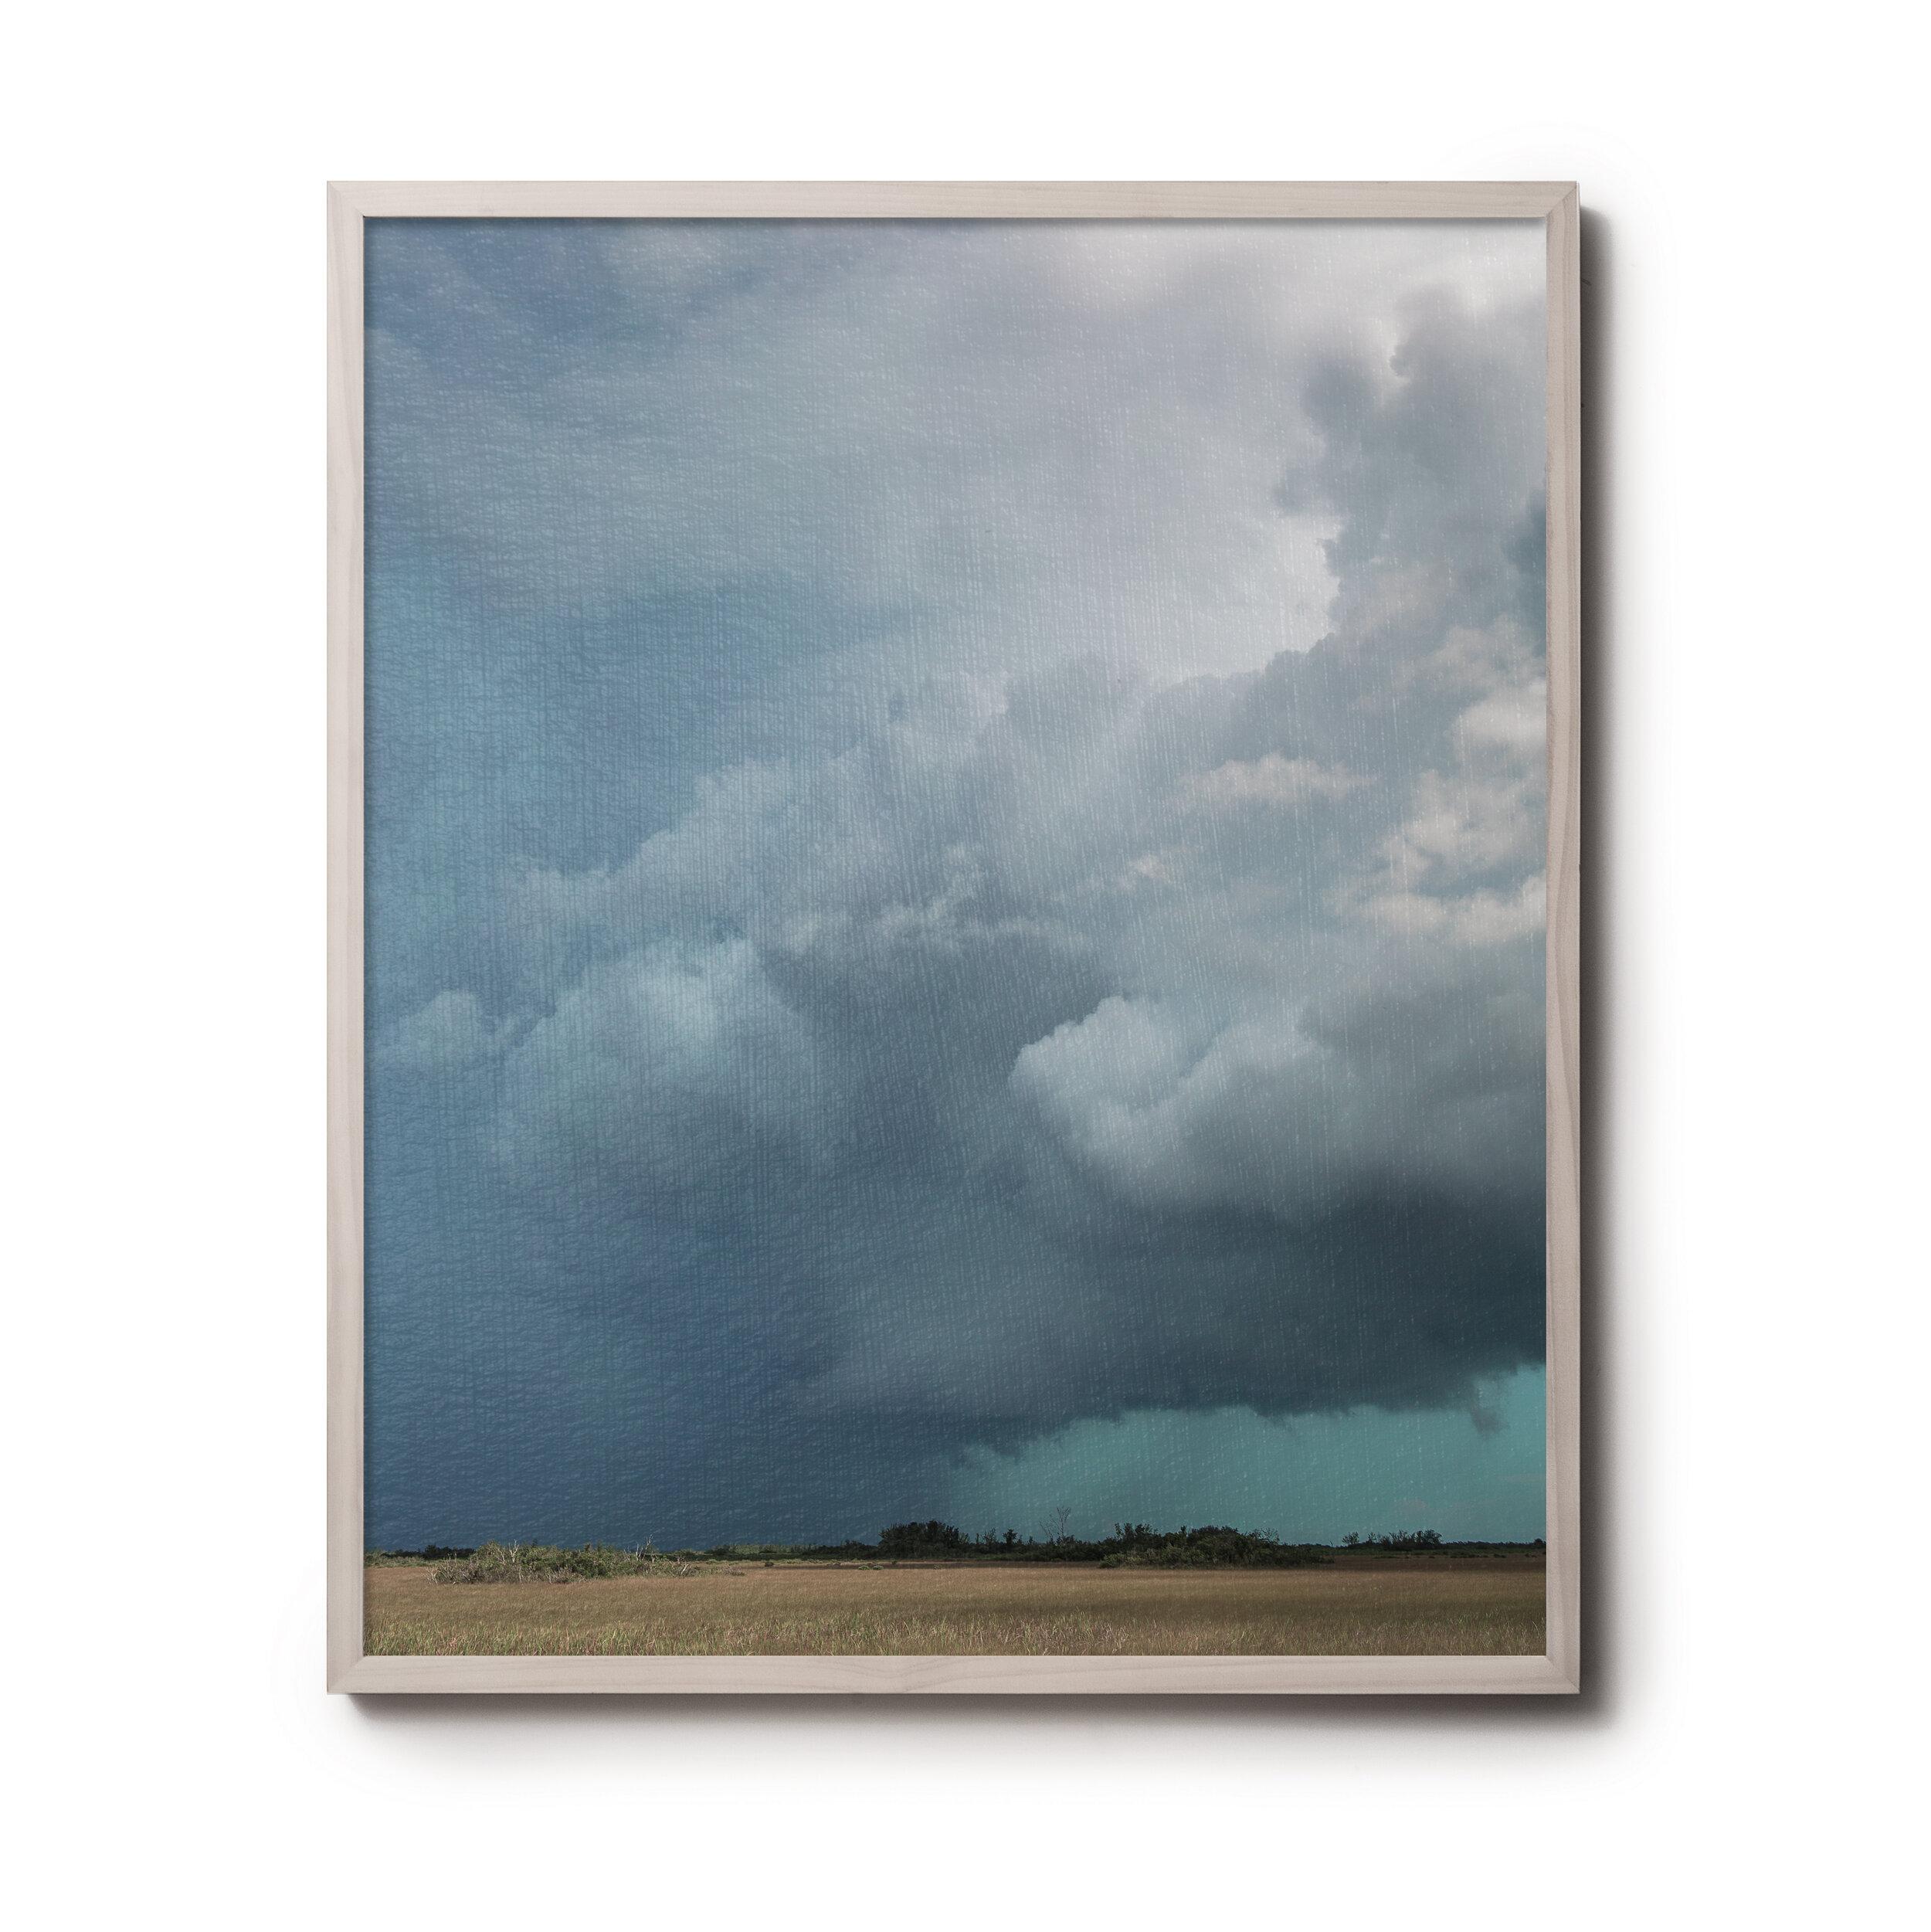 © David Gary Lloyd - Strength In The Wind - IMG_0434.jpg